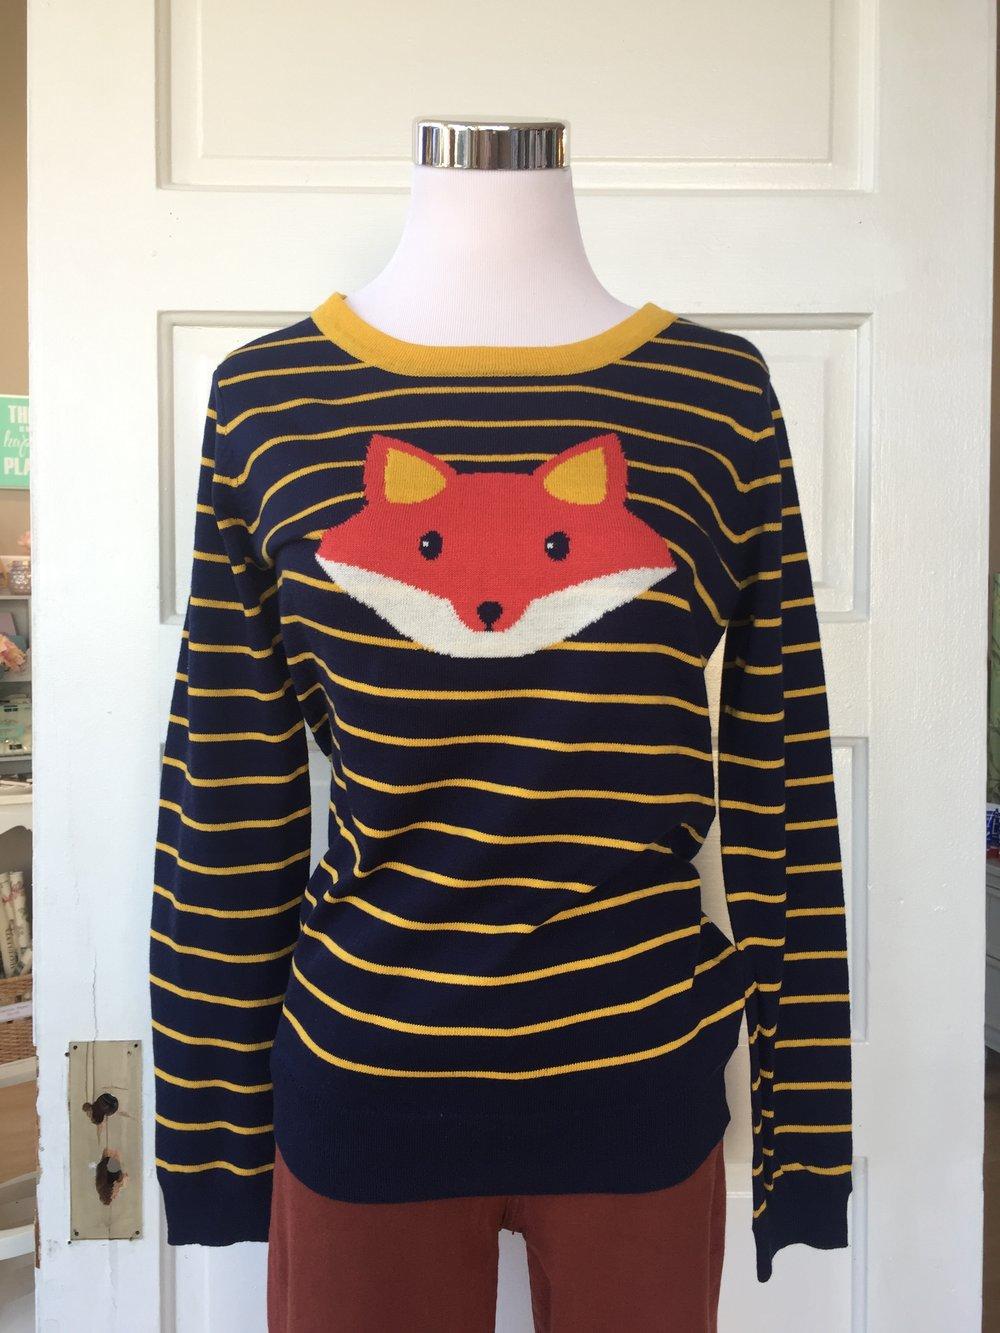 Foxy Sweater ($32)